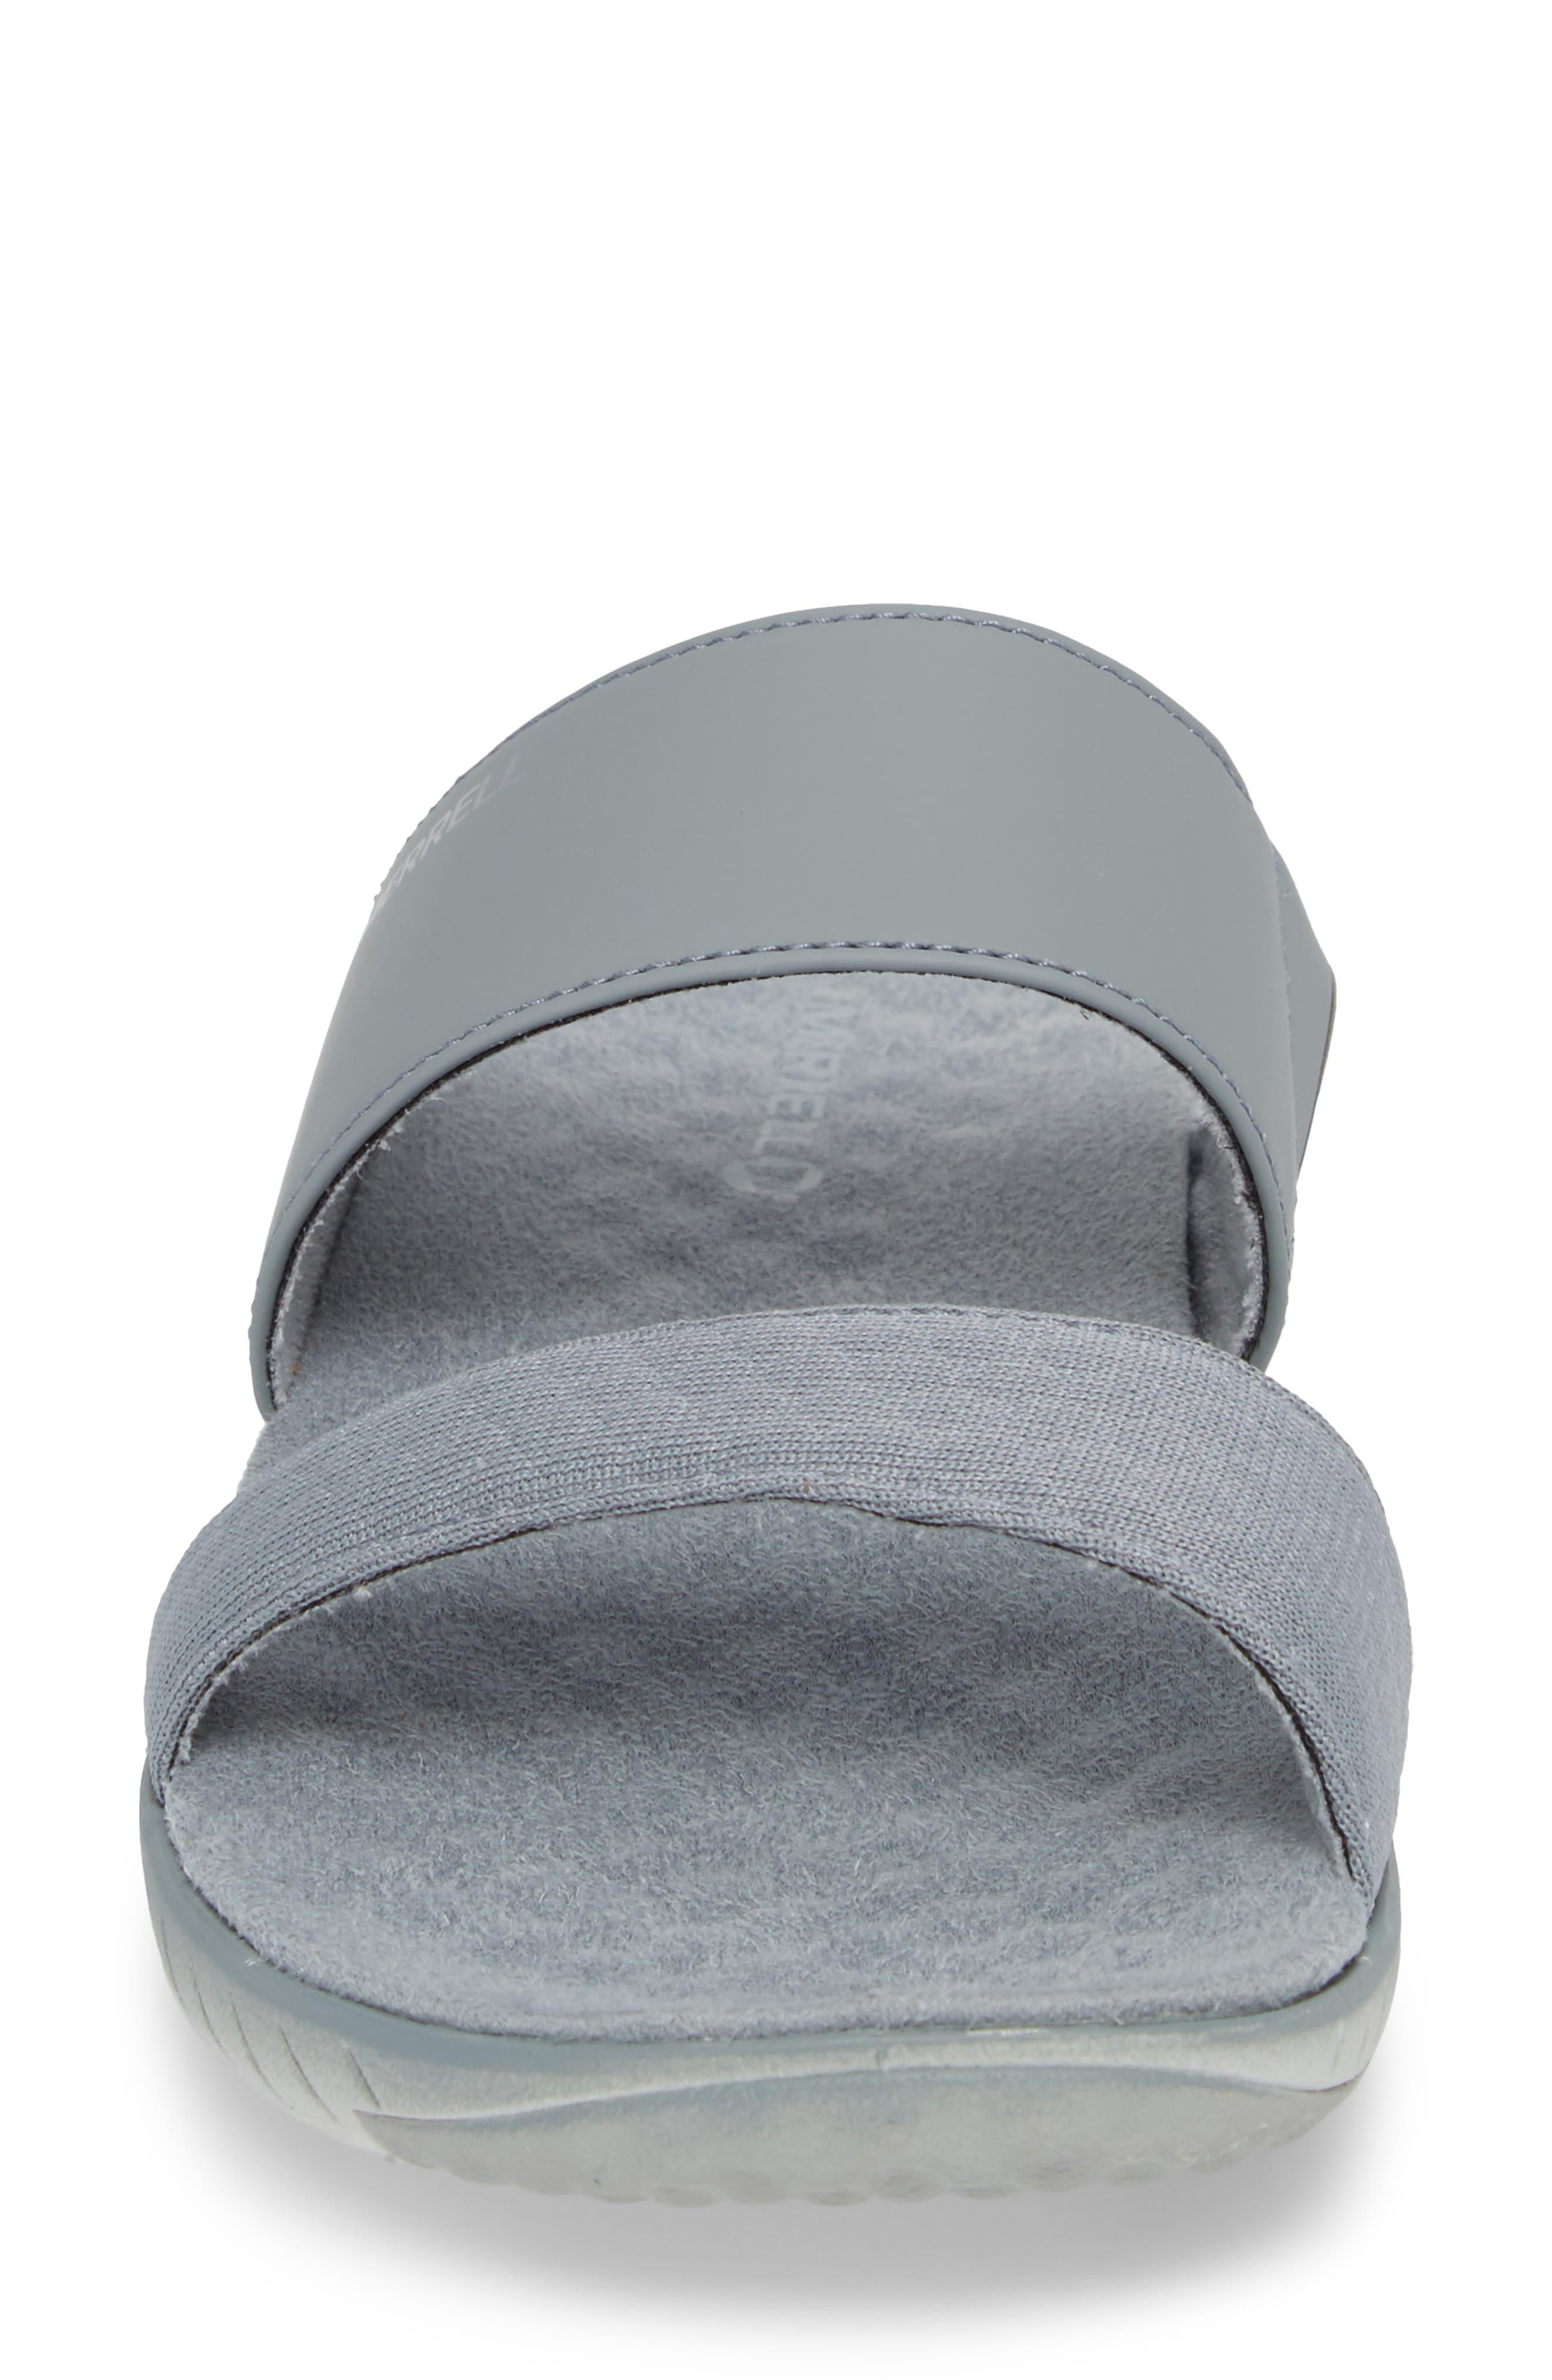 1SIX8 Linna Air Cushion+ Slide Sandal,                             Alternate thumbnail 14, color,